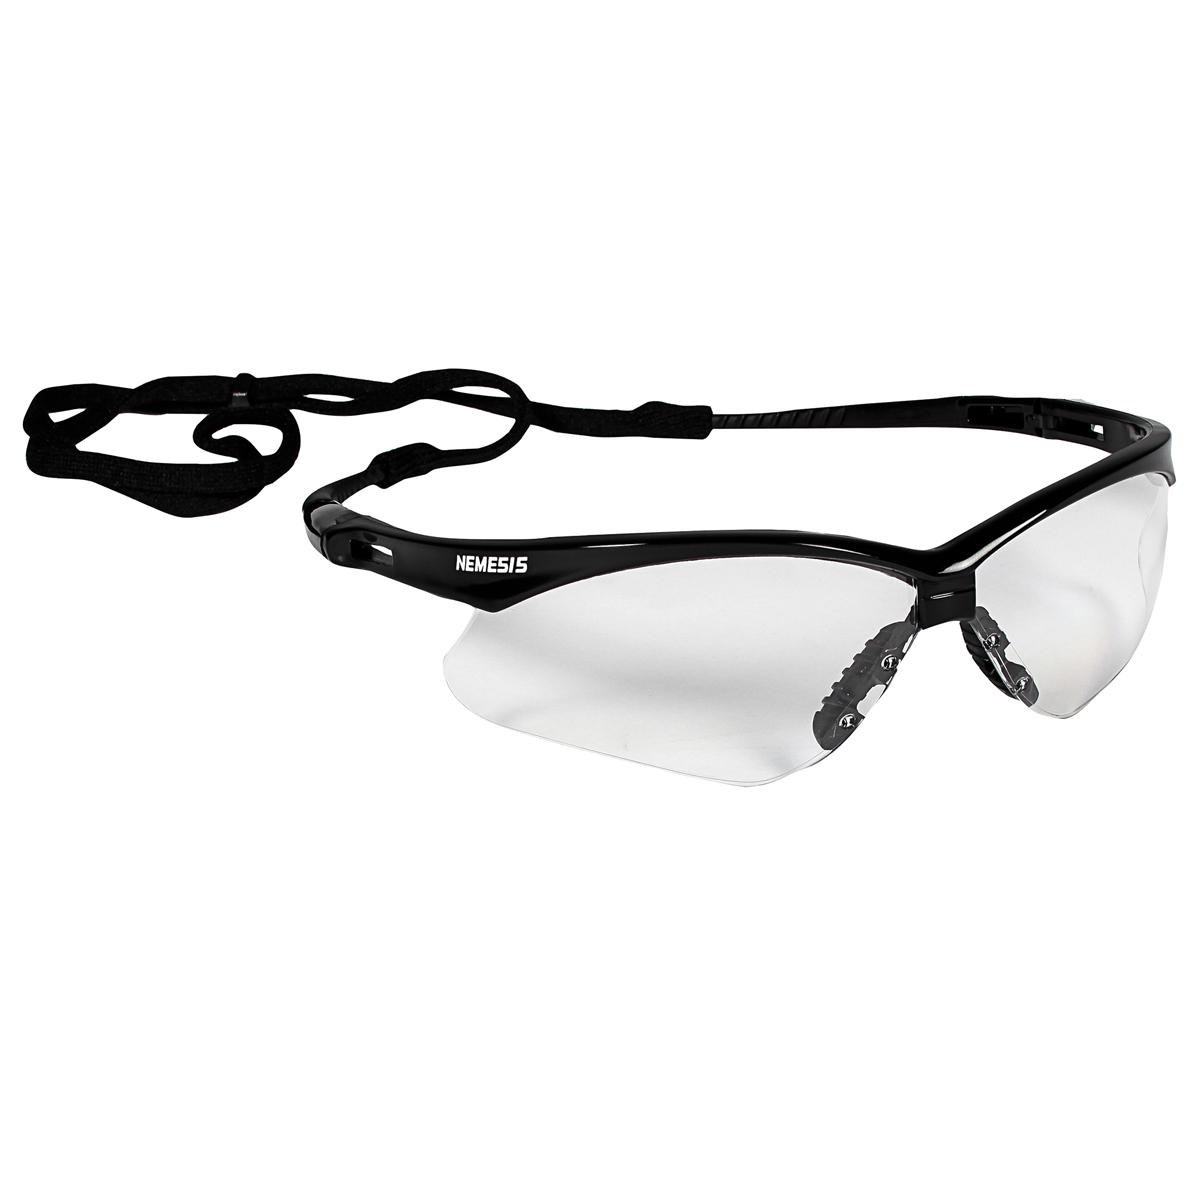 Anti-Fog-UV-Schwimmbrille kx Schwarzer Nasenclip Ohrstöpsel